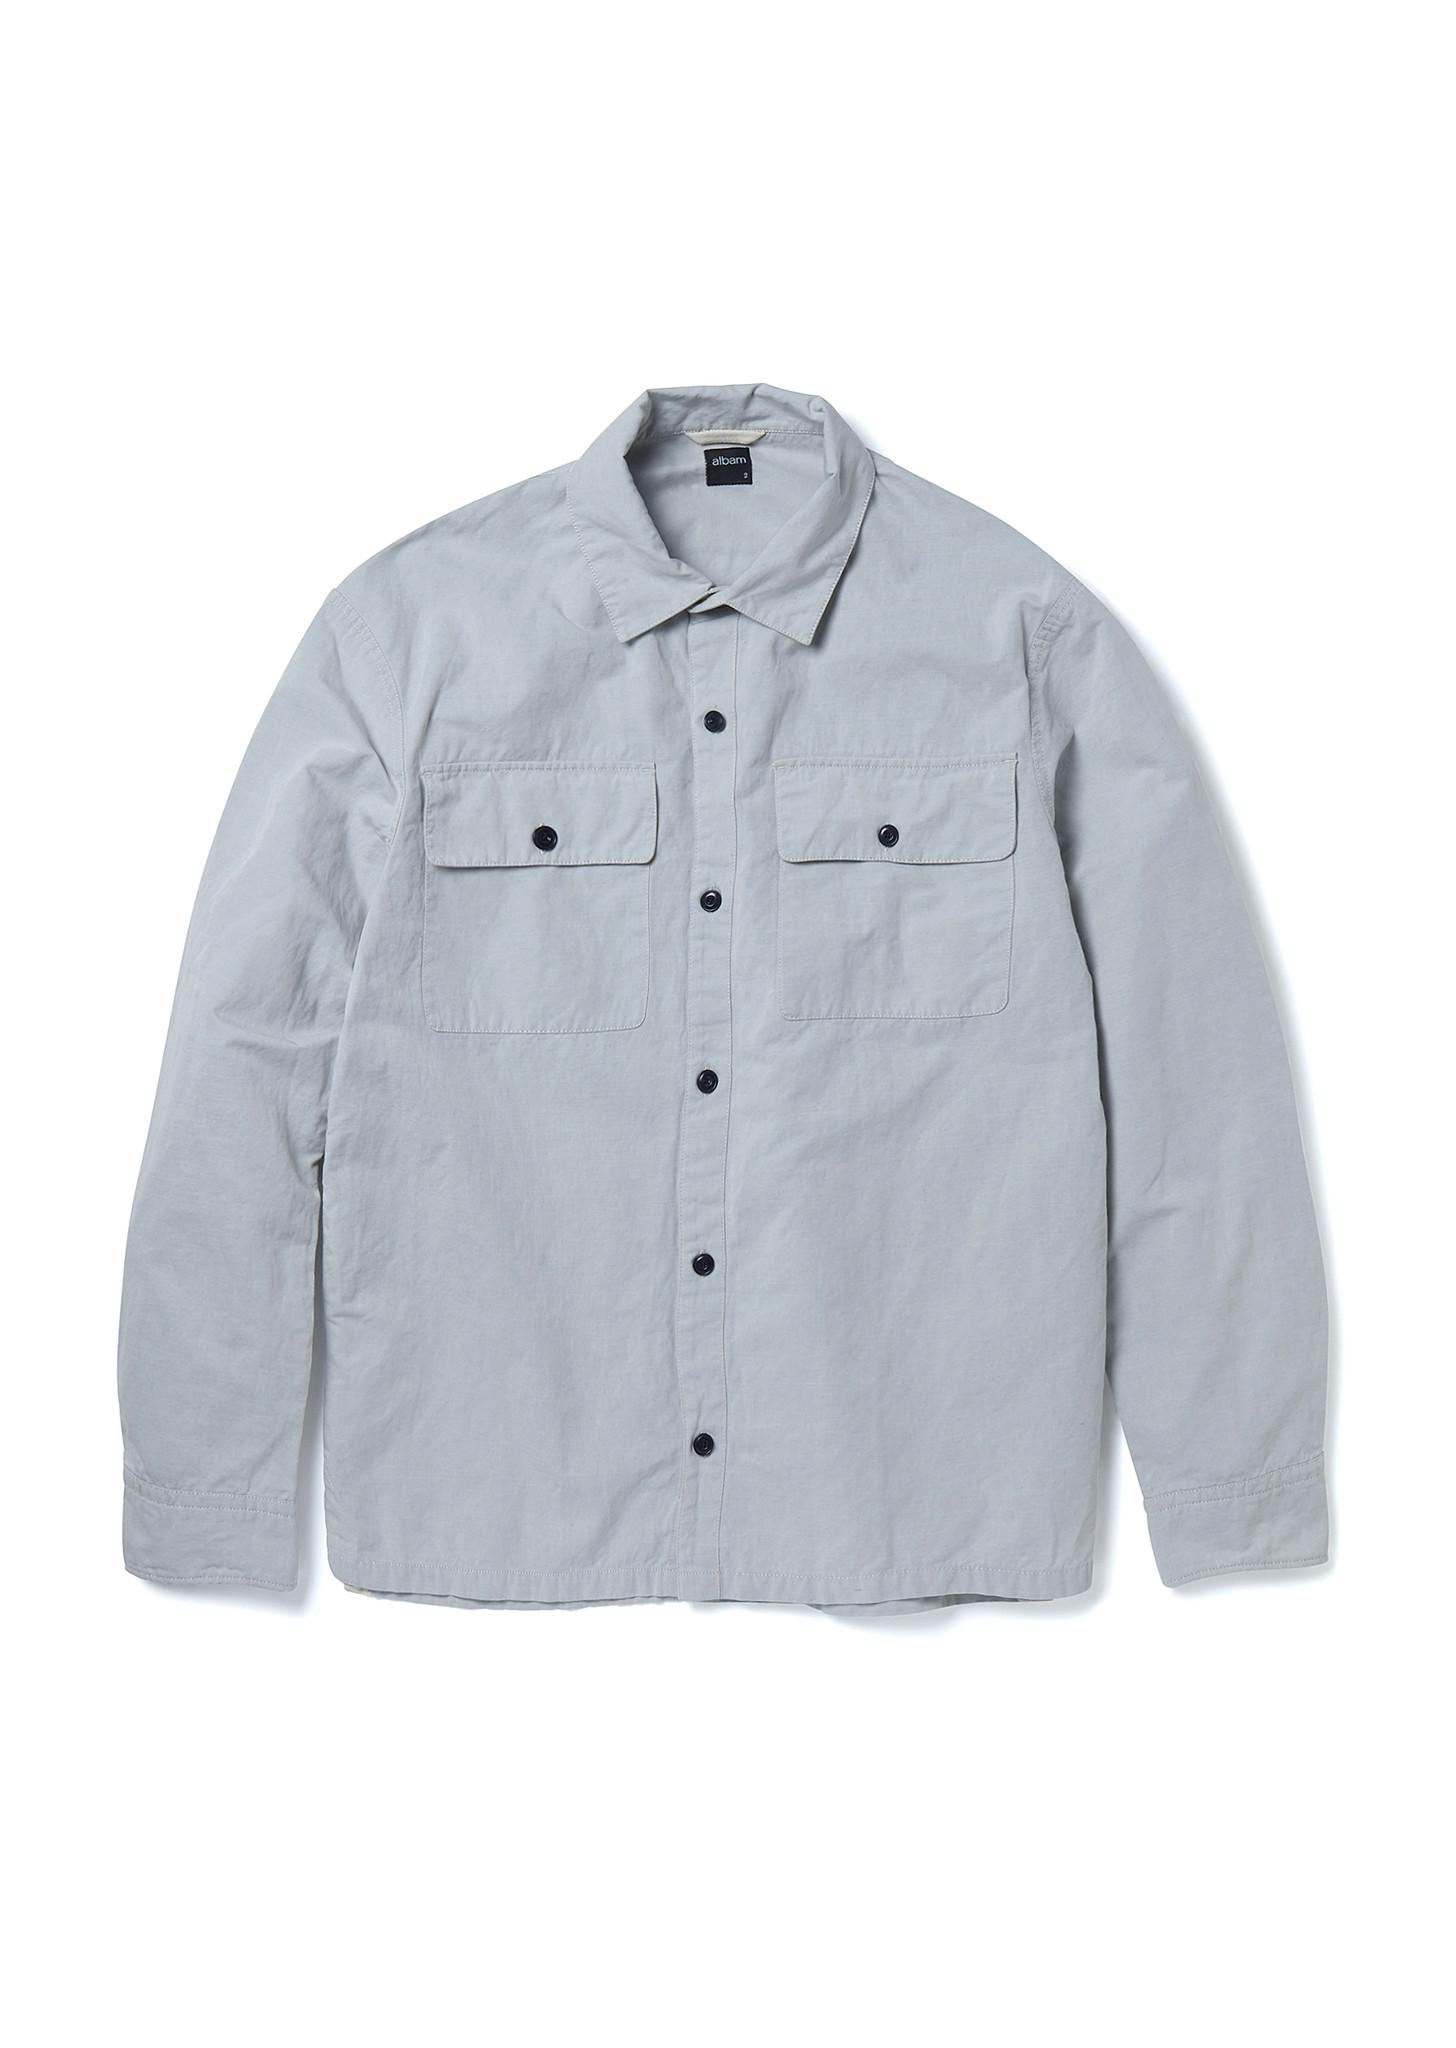 shirt1_01